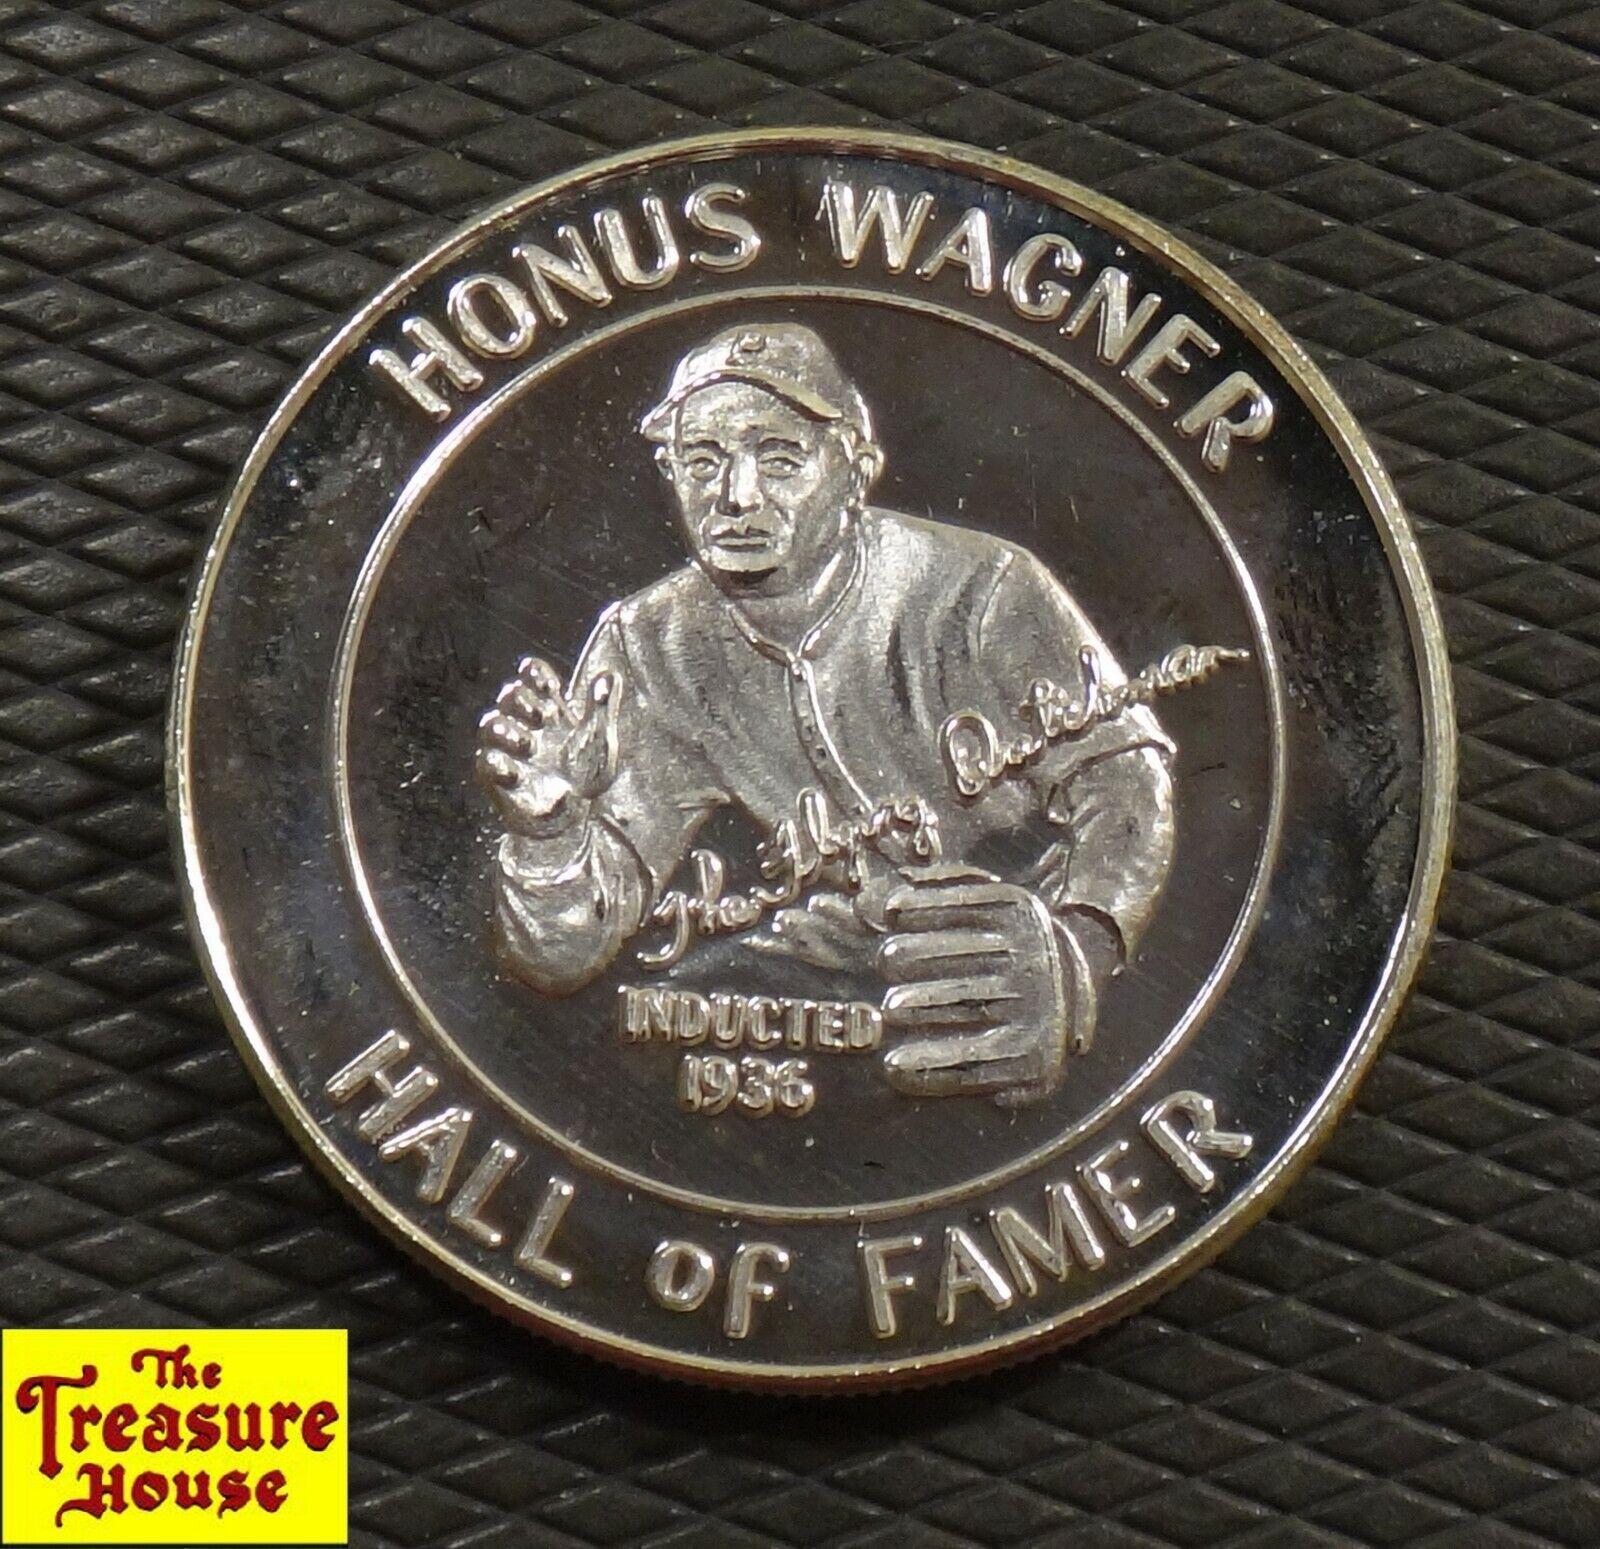 Vintage honus wagner .999 fine silver 1 oz-t baseball hall of famer proof round